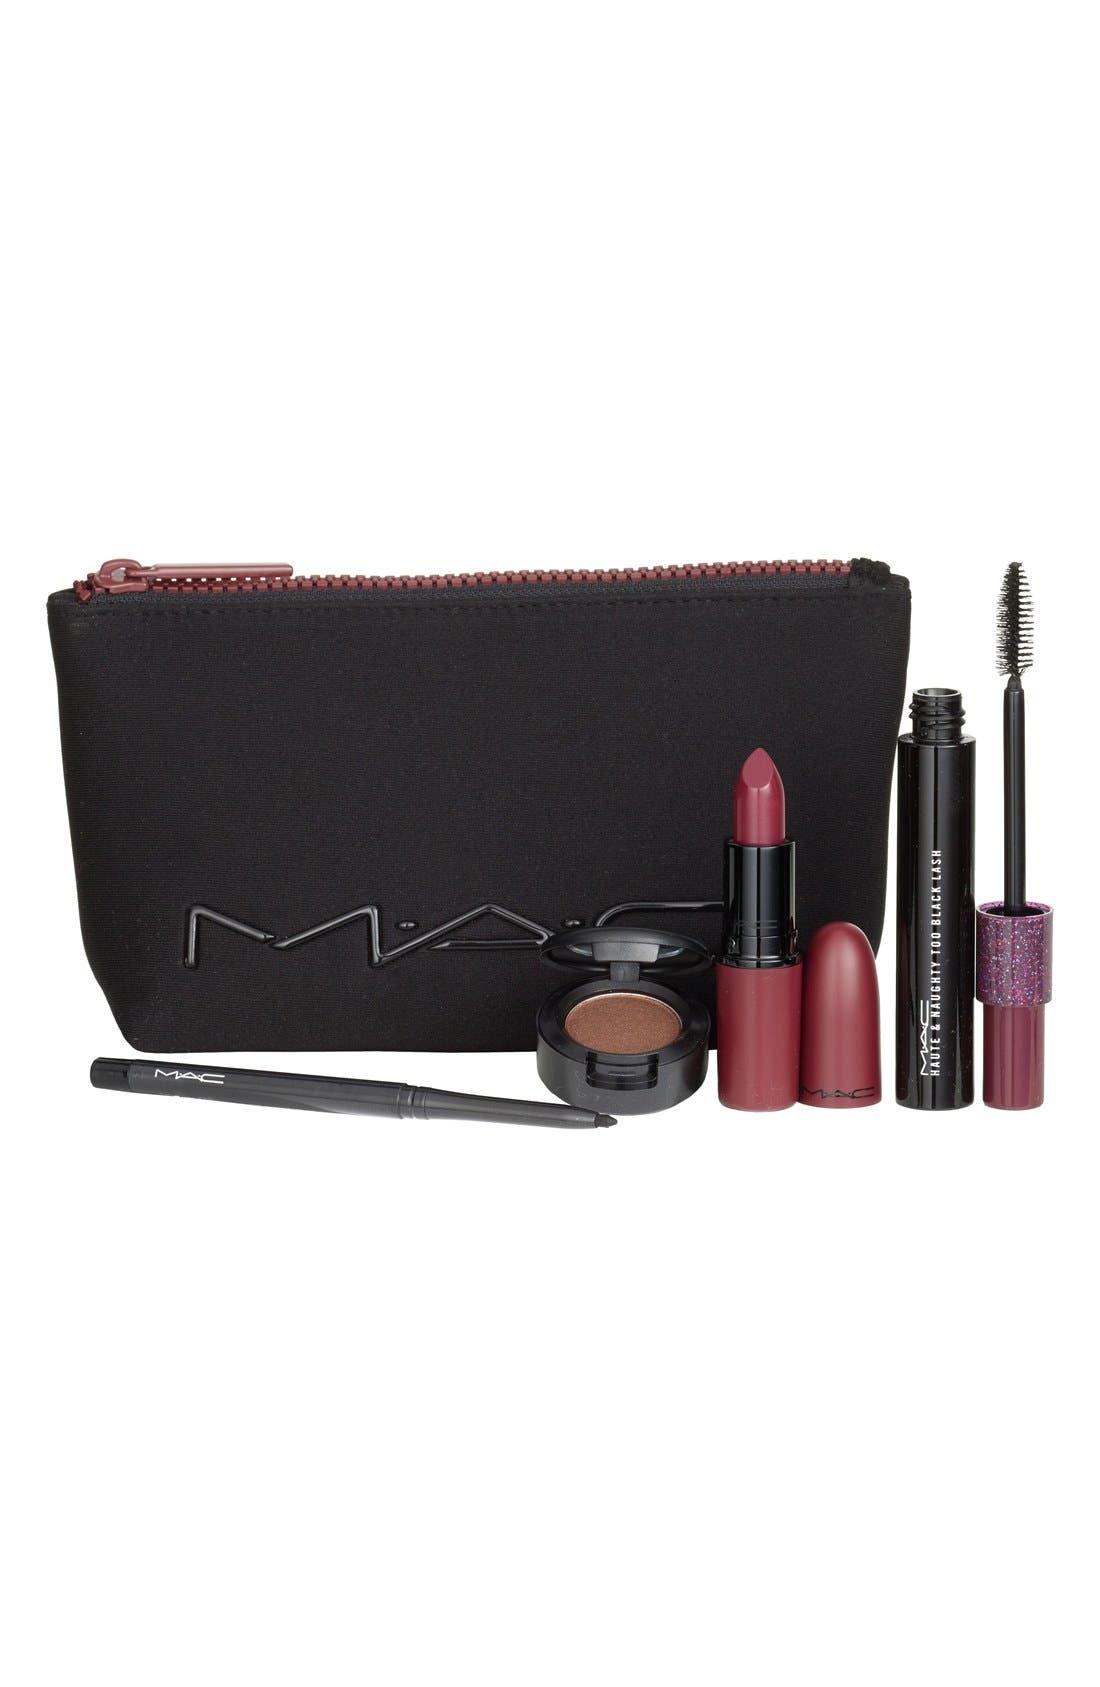 Main Image - MAC 'Look in a Box - Sassy Siren' Burgundy Lip & Eye Kit (Nordstrom Exclusive) ($71.50 Value)